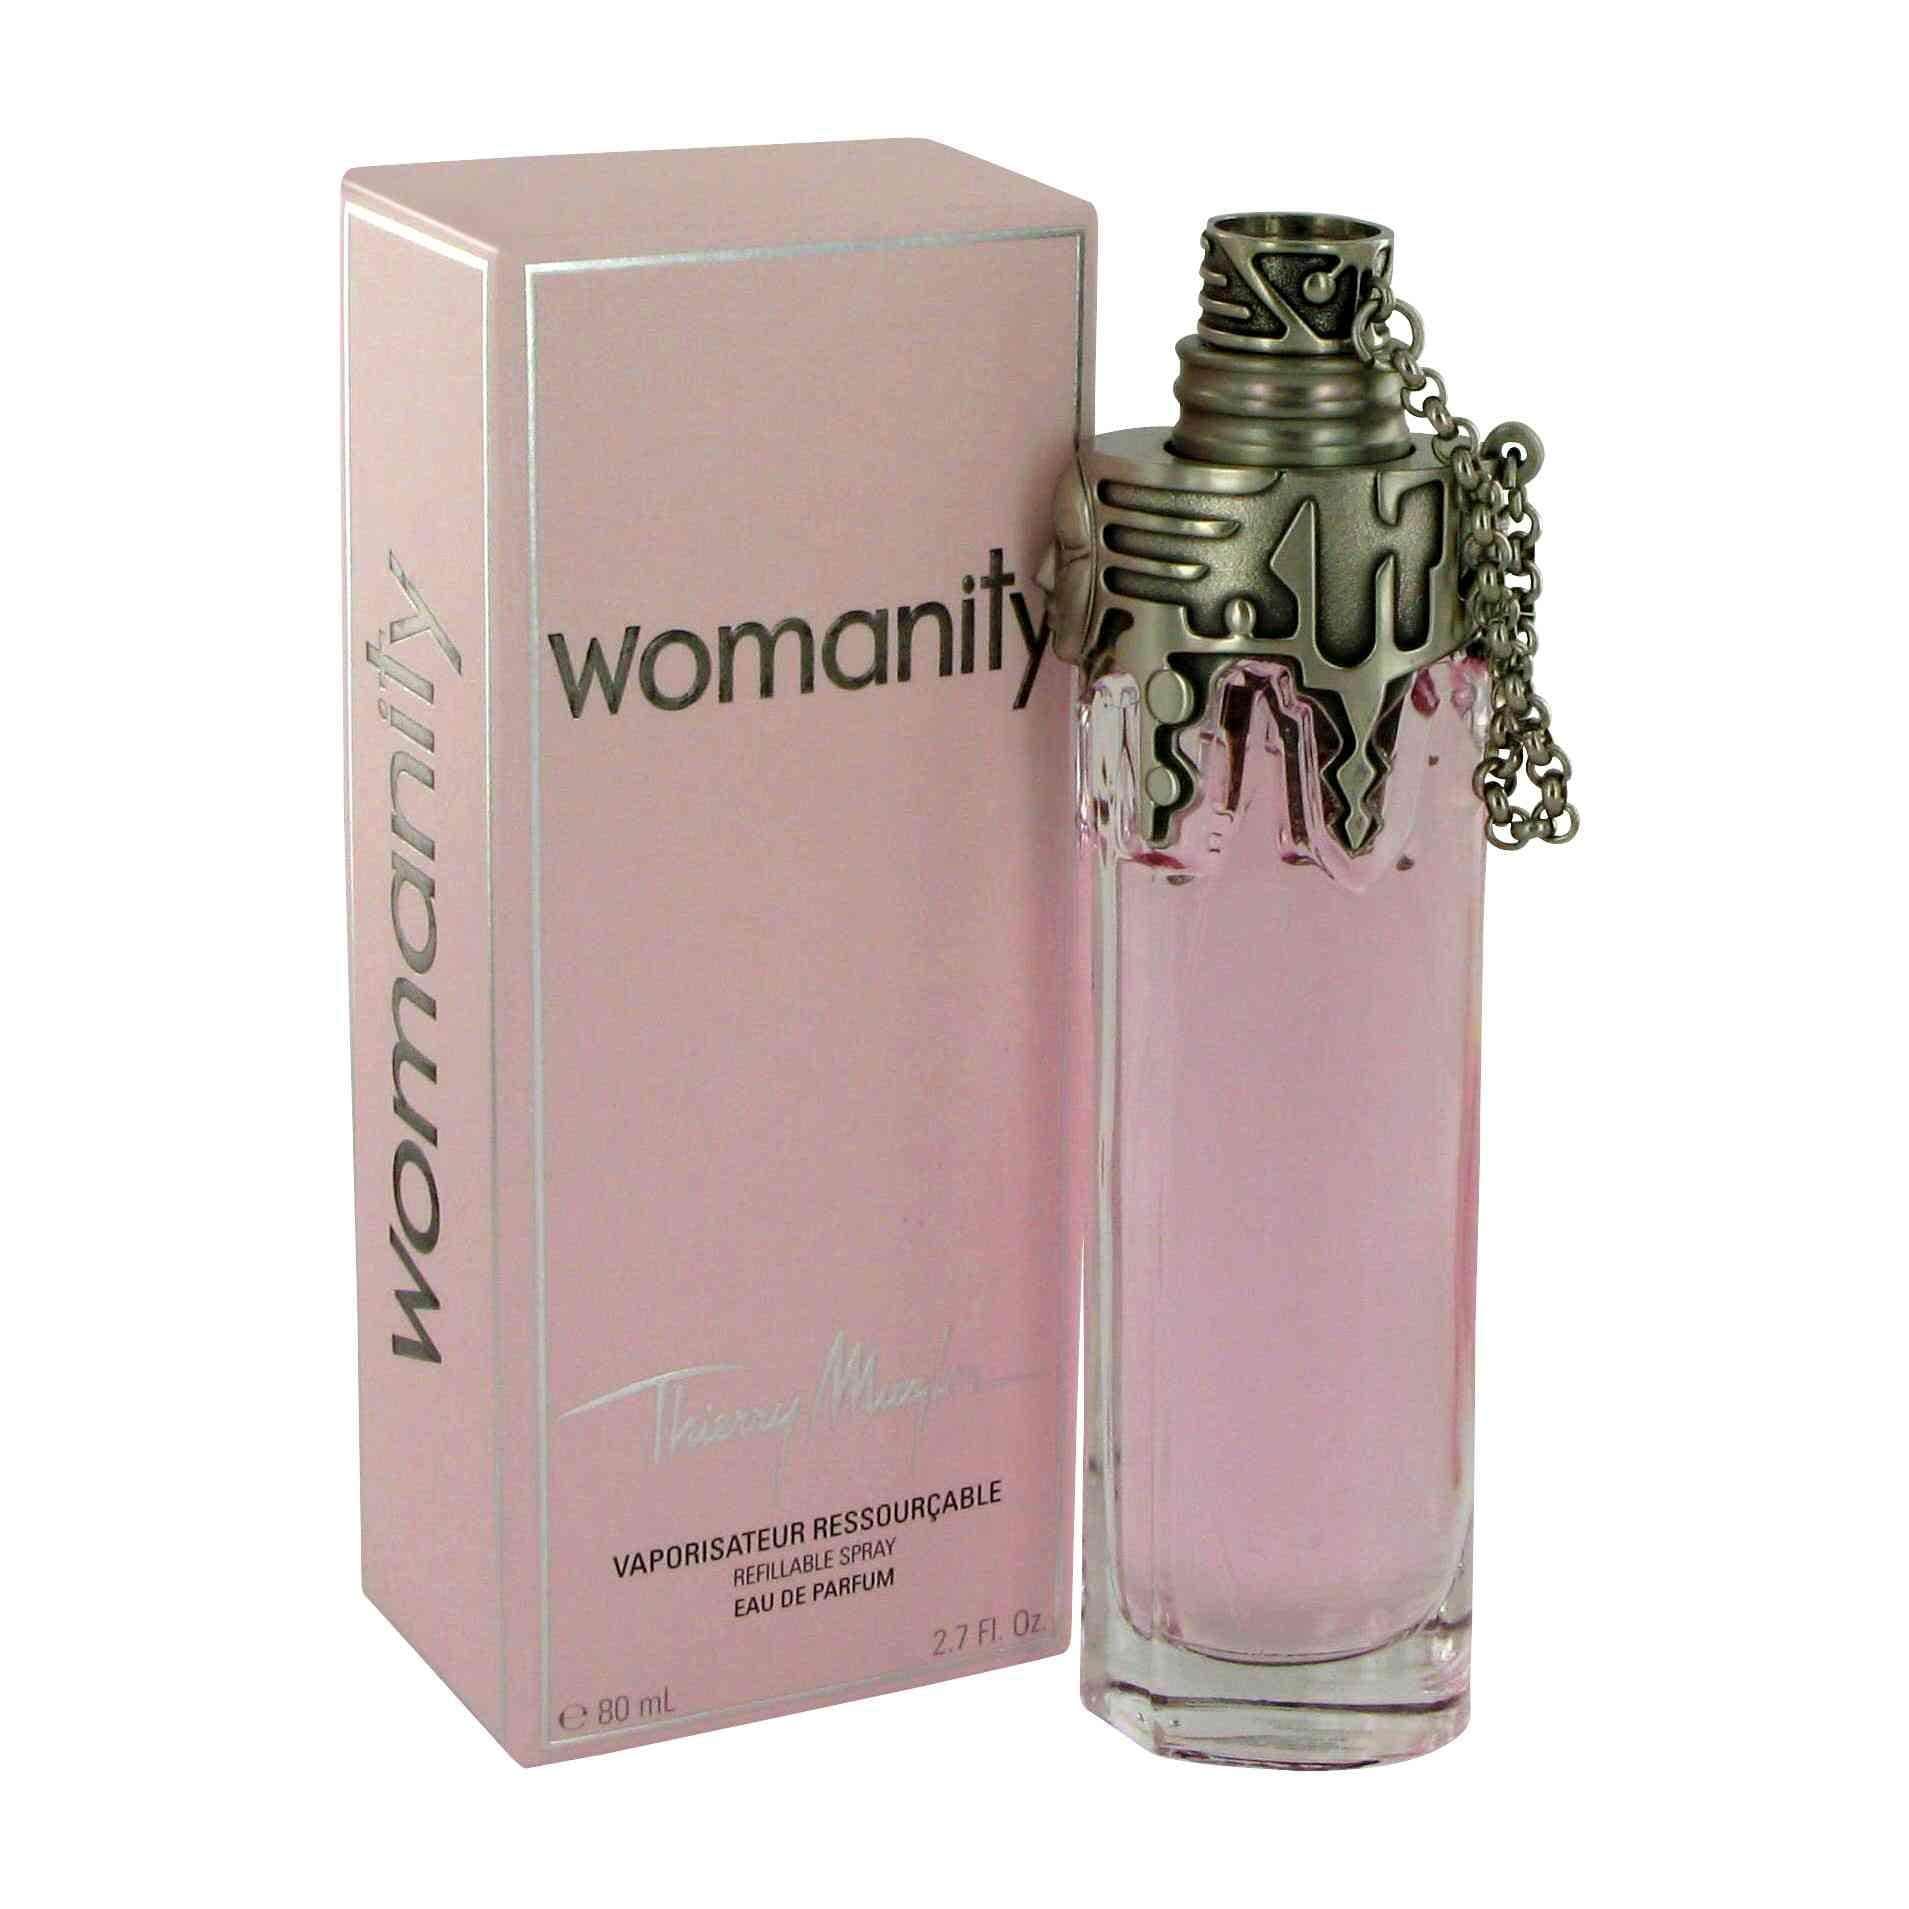 thierry mugler 39 womanity 39 women 39 s 2 7 ounce eau de parfum spray overstock shopping big. Black Bedroom Furniture Sets. Home Design Ideas